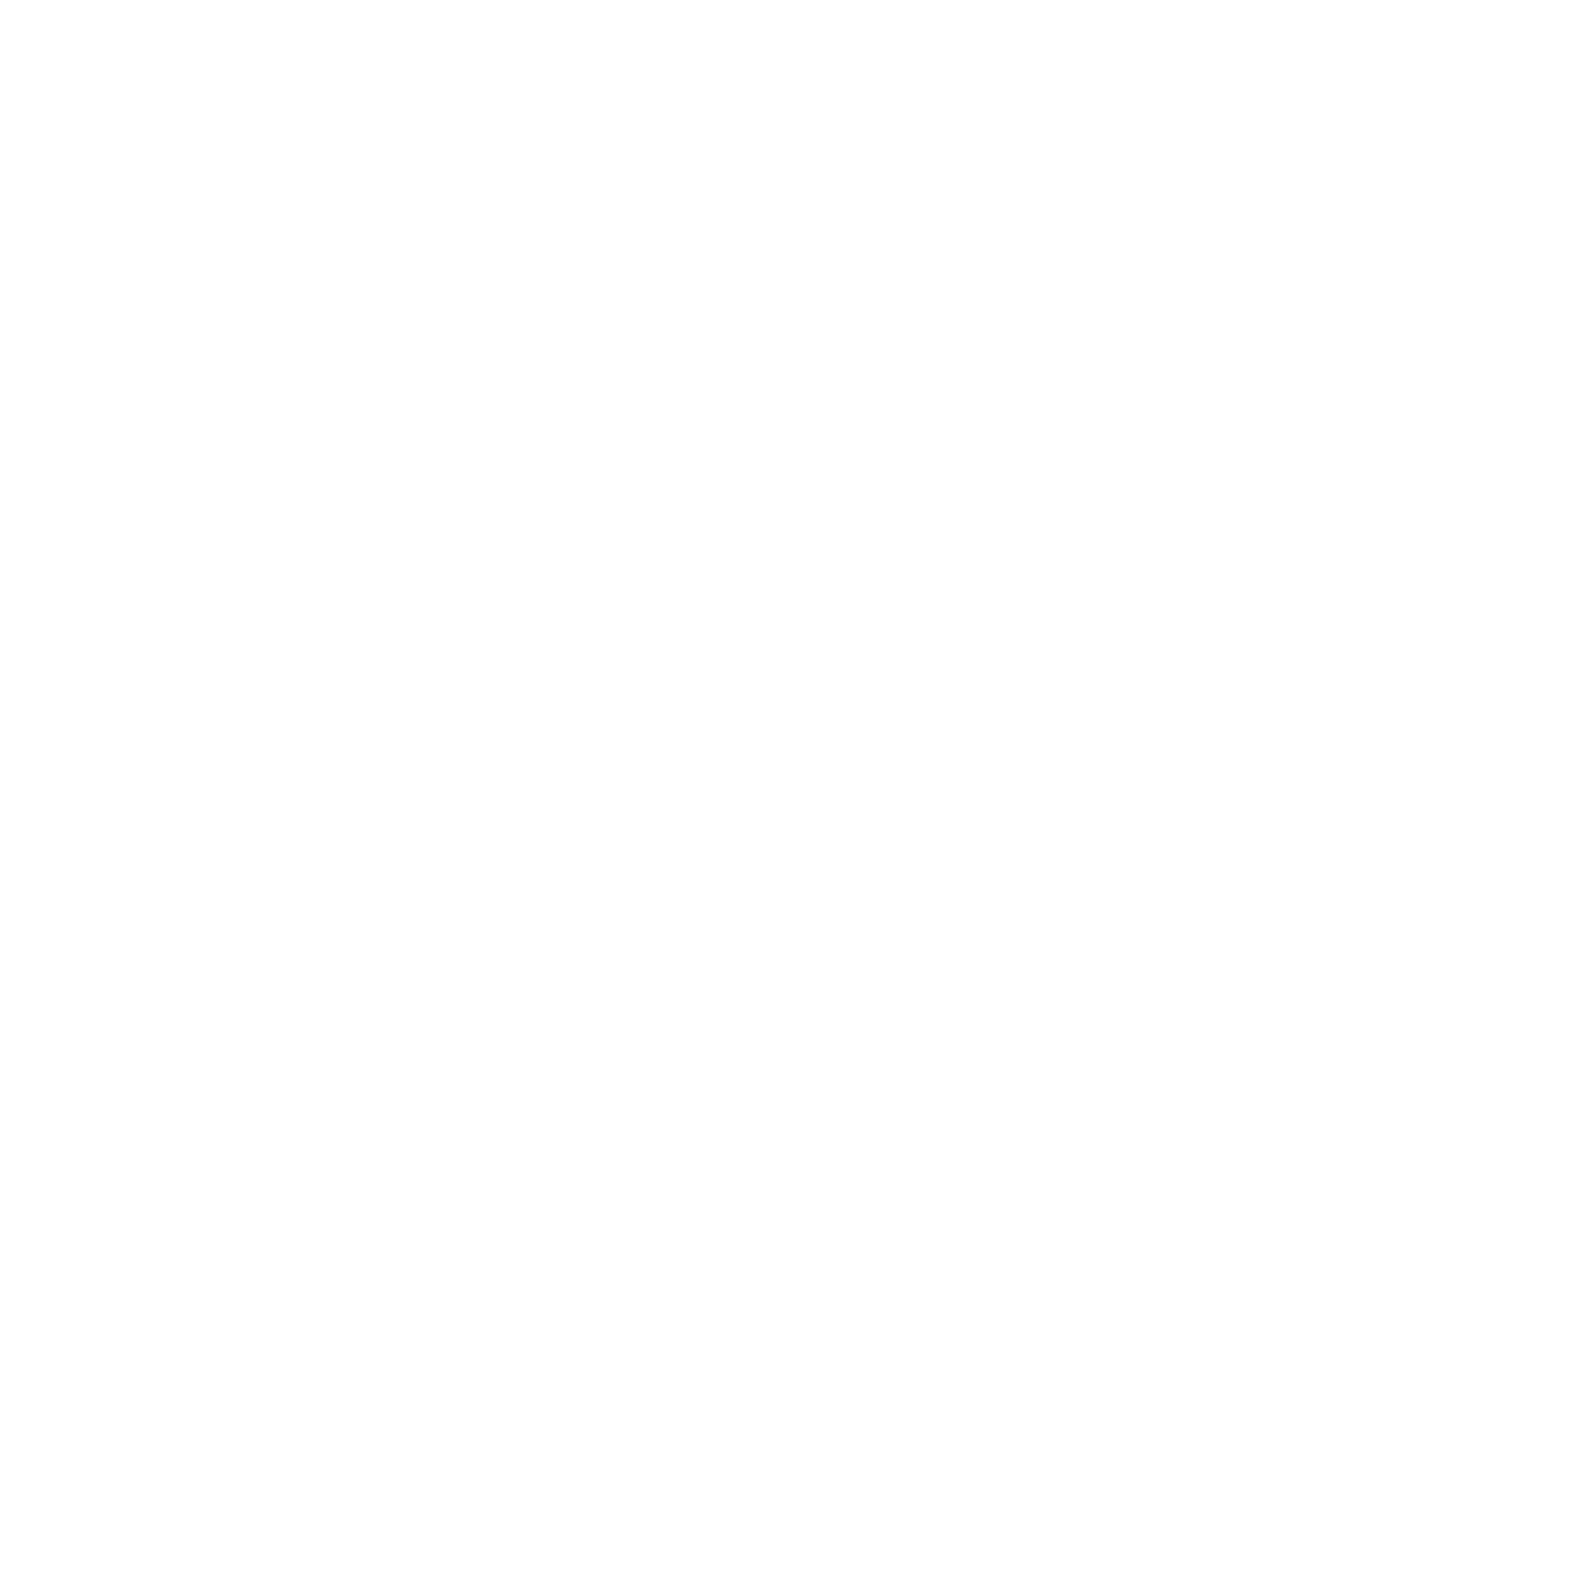 logo picto blanc